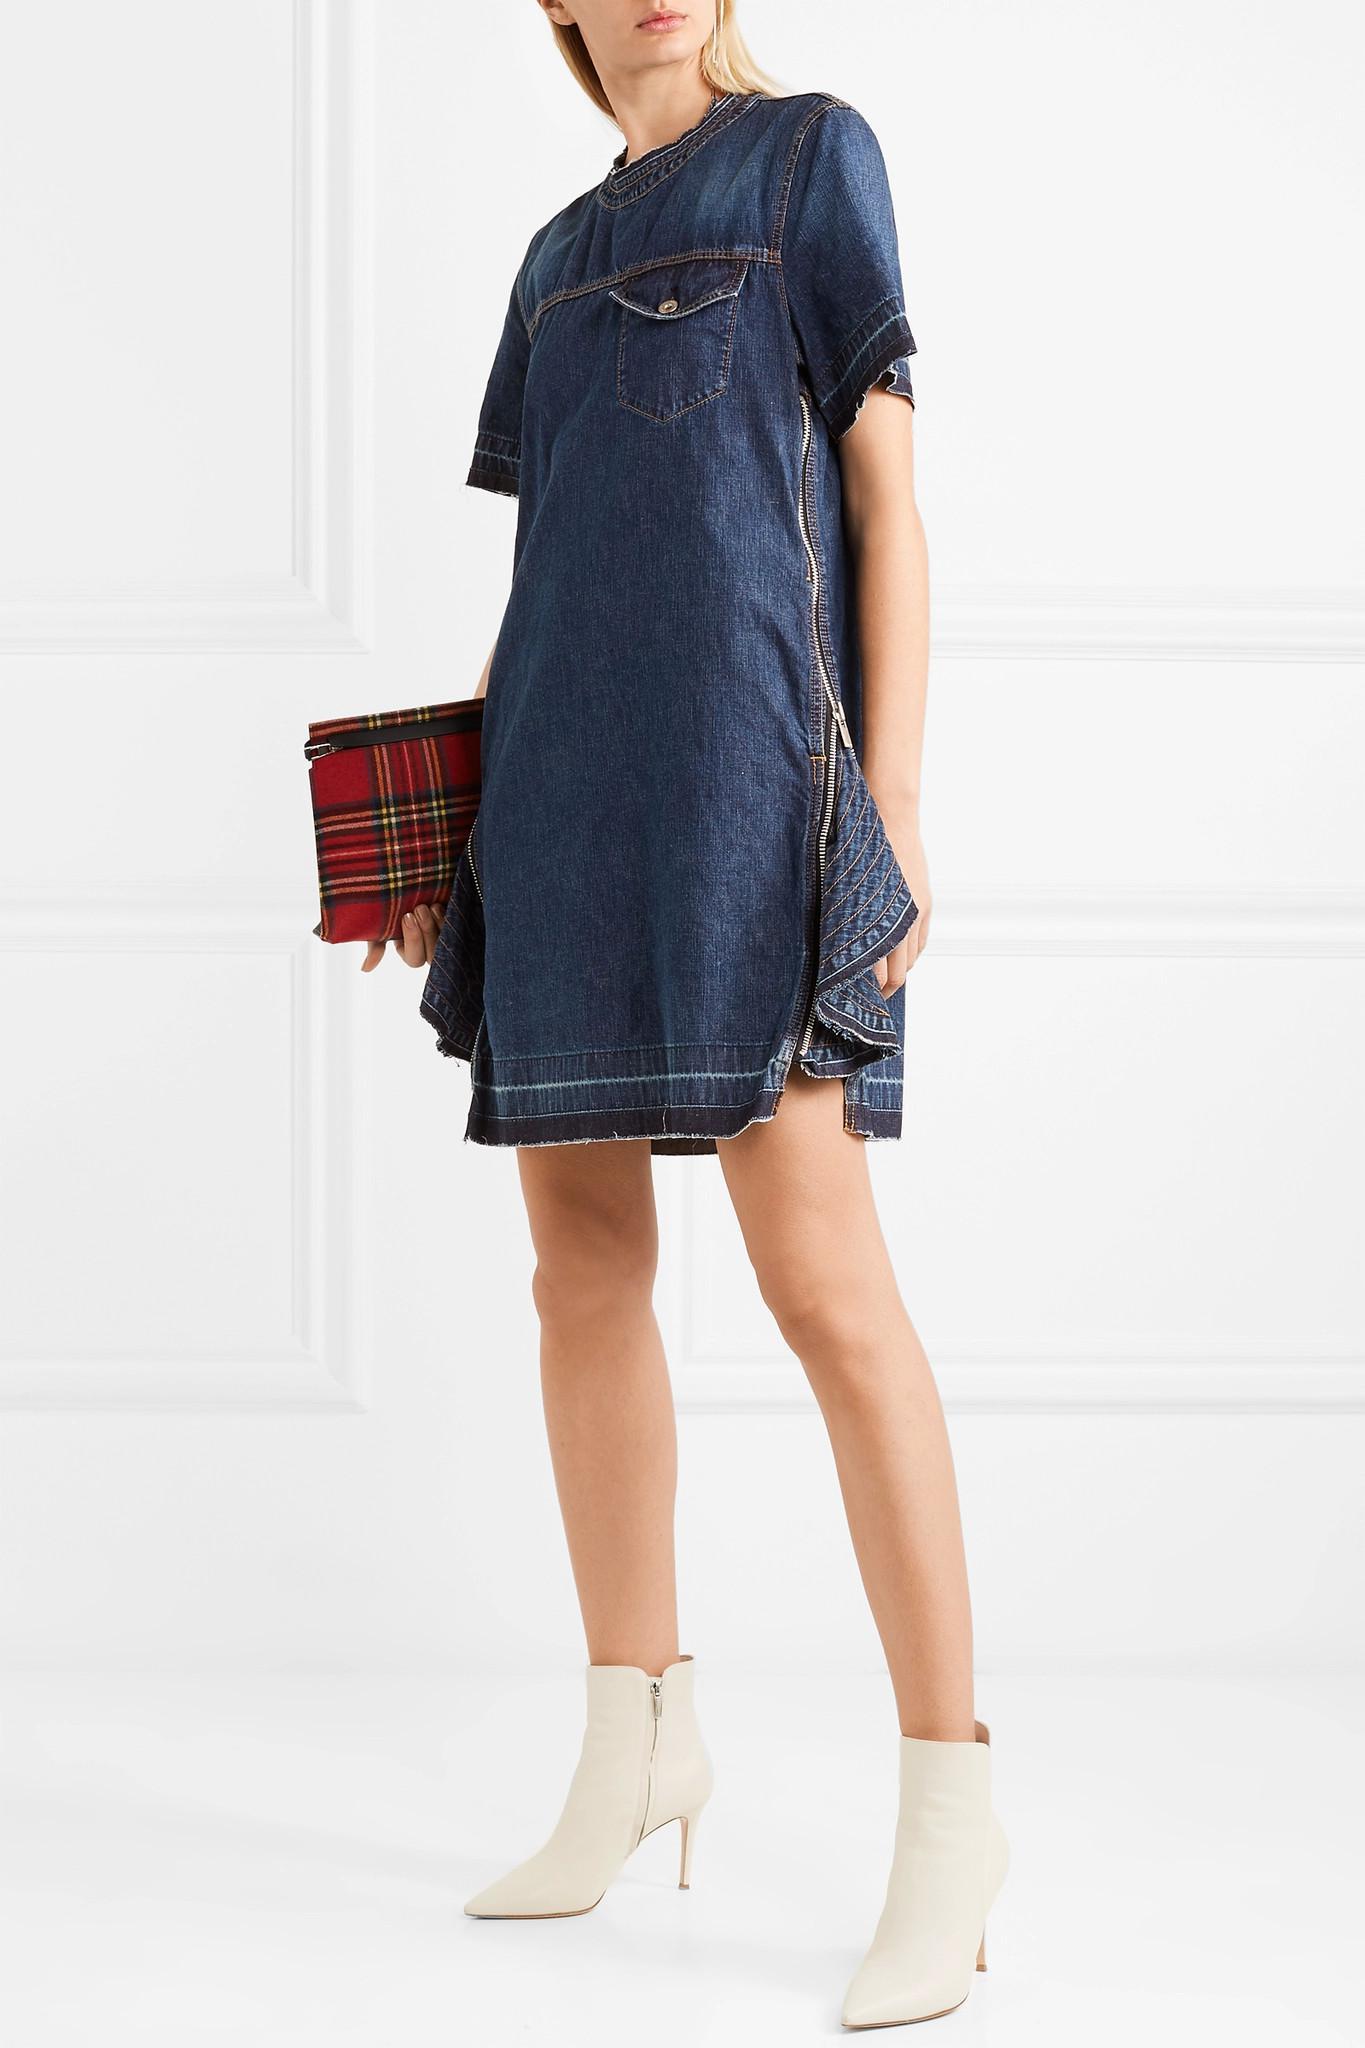 Zip-embellished Denim Dress - Dark denim sacai Free Shipping Newest dKSDLvuhXG